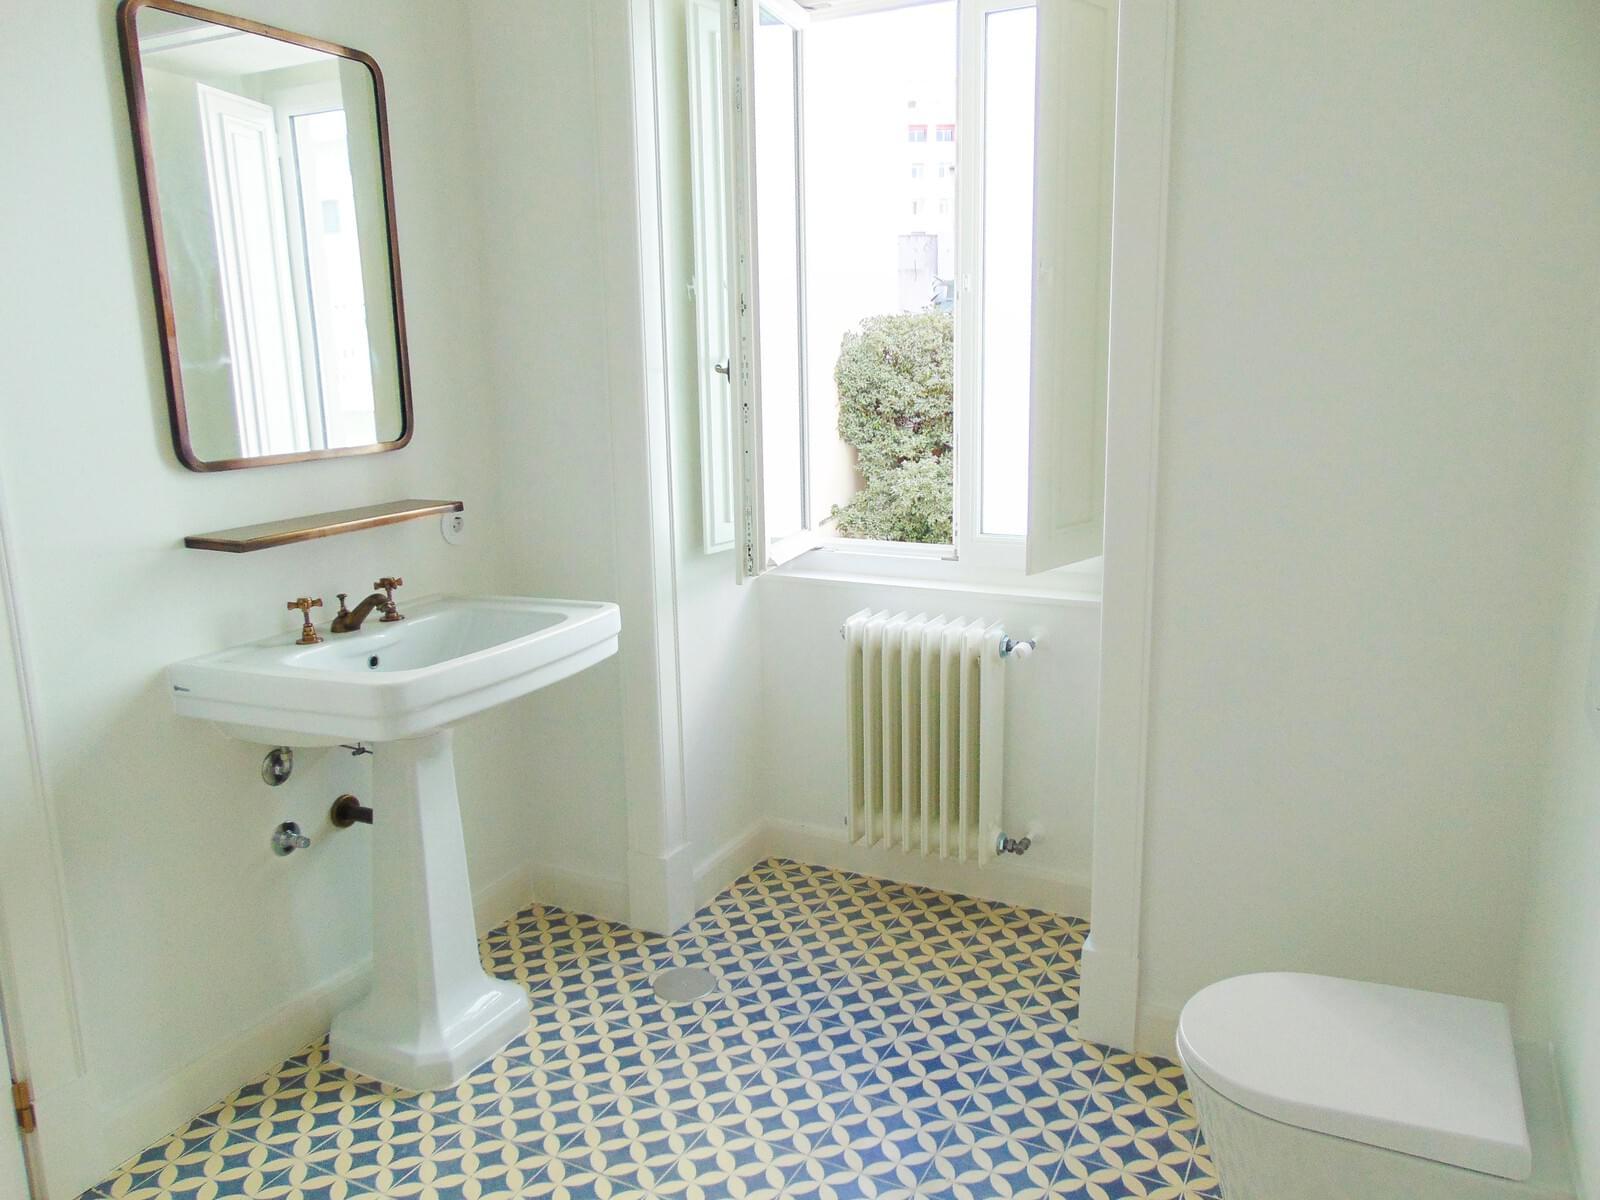 pf18152-apartamento-t2-lisboa-ce1a2663-d559-4108-a714-2e47c0b75430